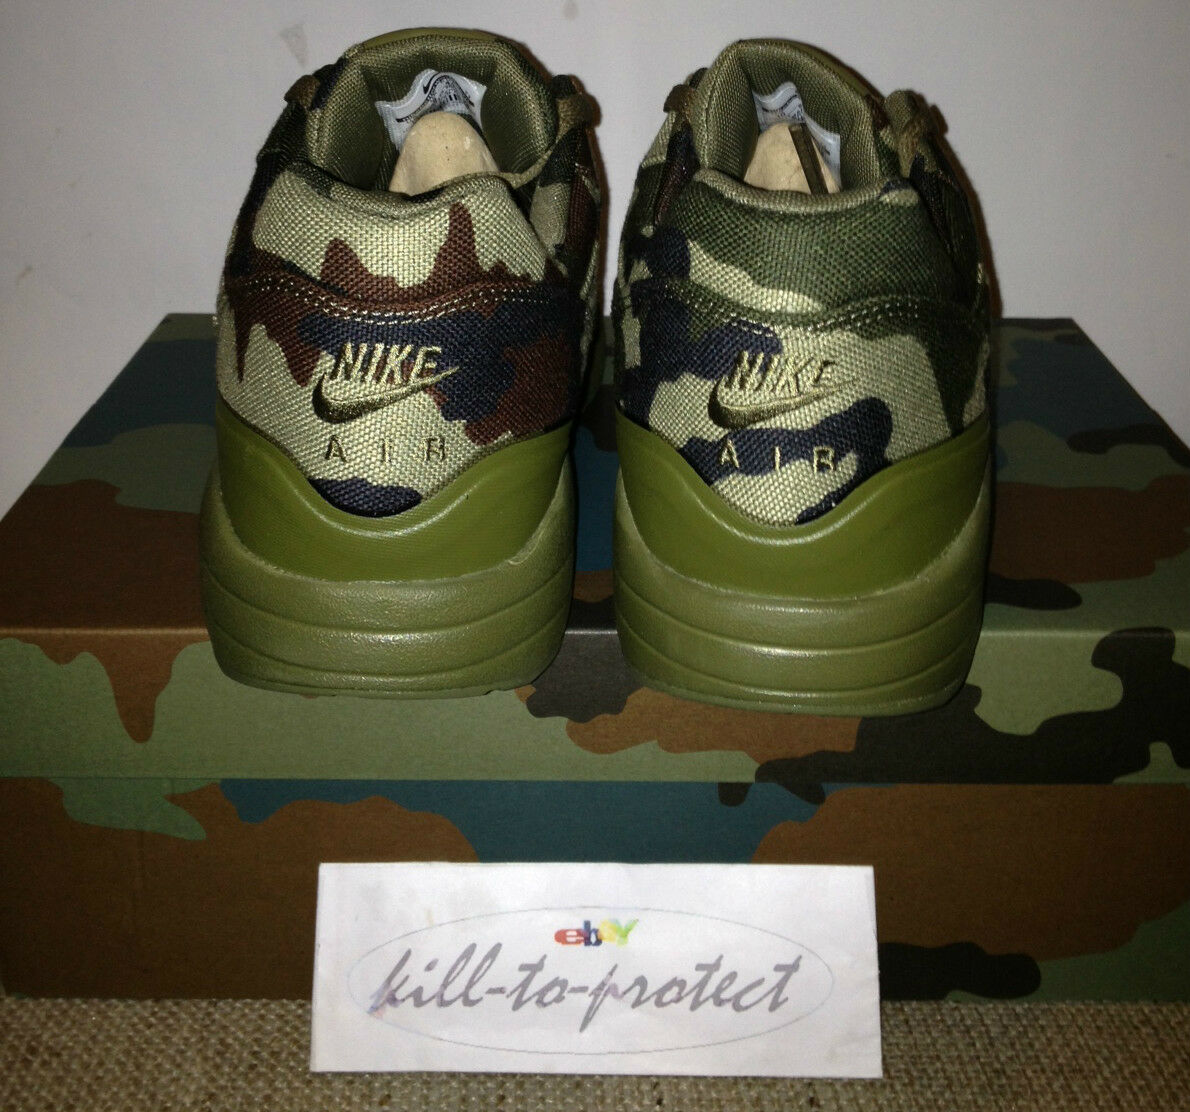 Nike air max 1 1 frankreich pack land camo pack frankreich italien sp uns uk7 8 9 10 11 607473-200 55c884